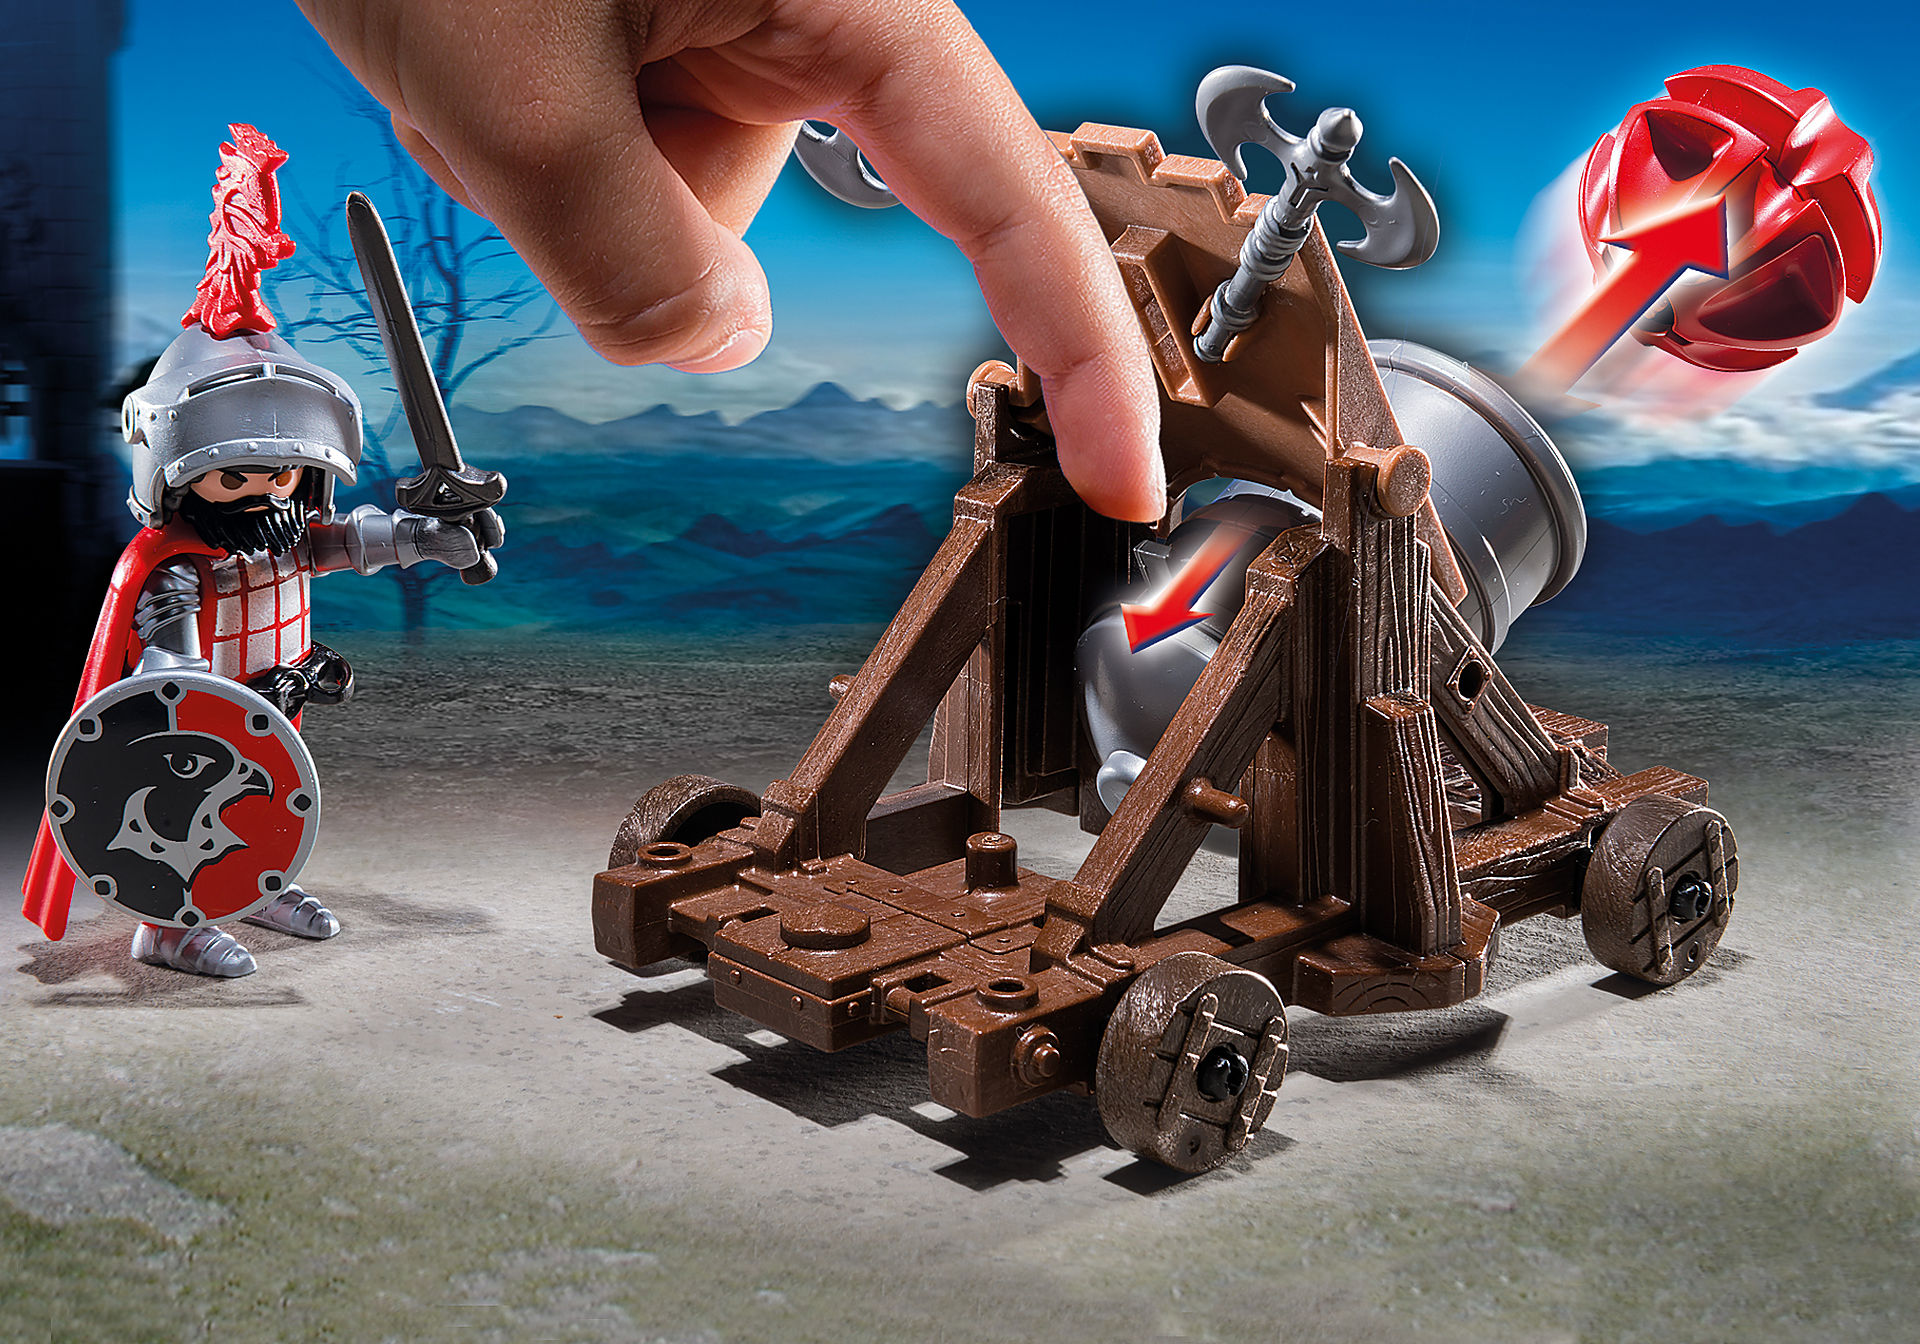 http://media.playmobil.com/i/playmobil/6038_product_extra2/Riesenkanone der Falkenritter